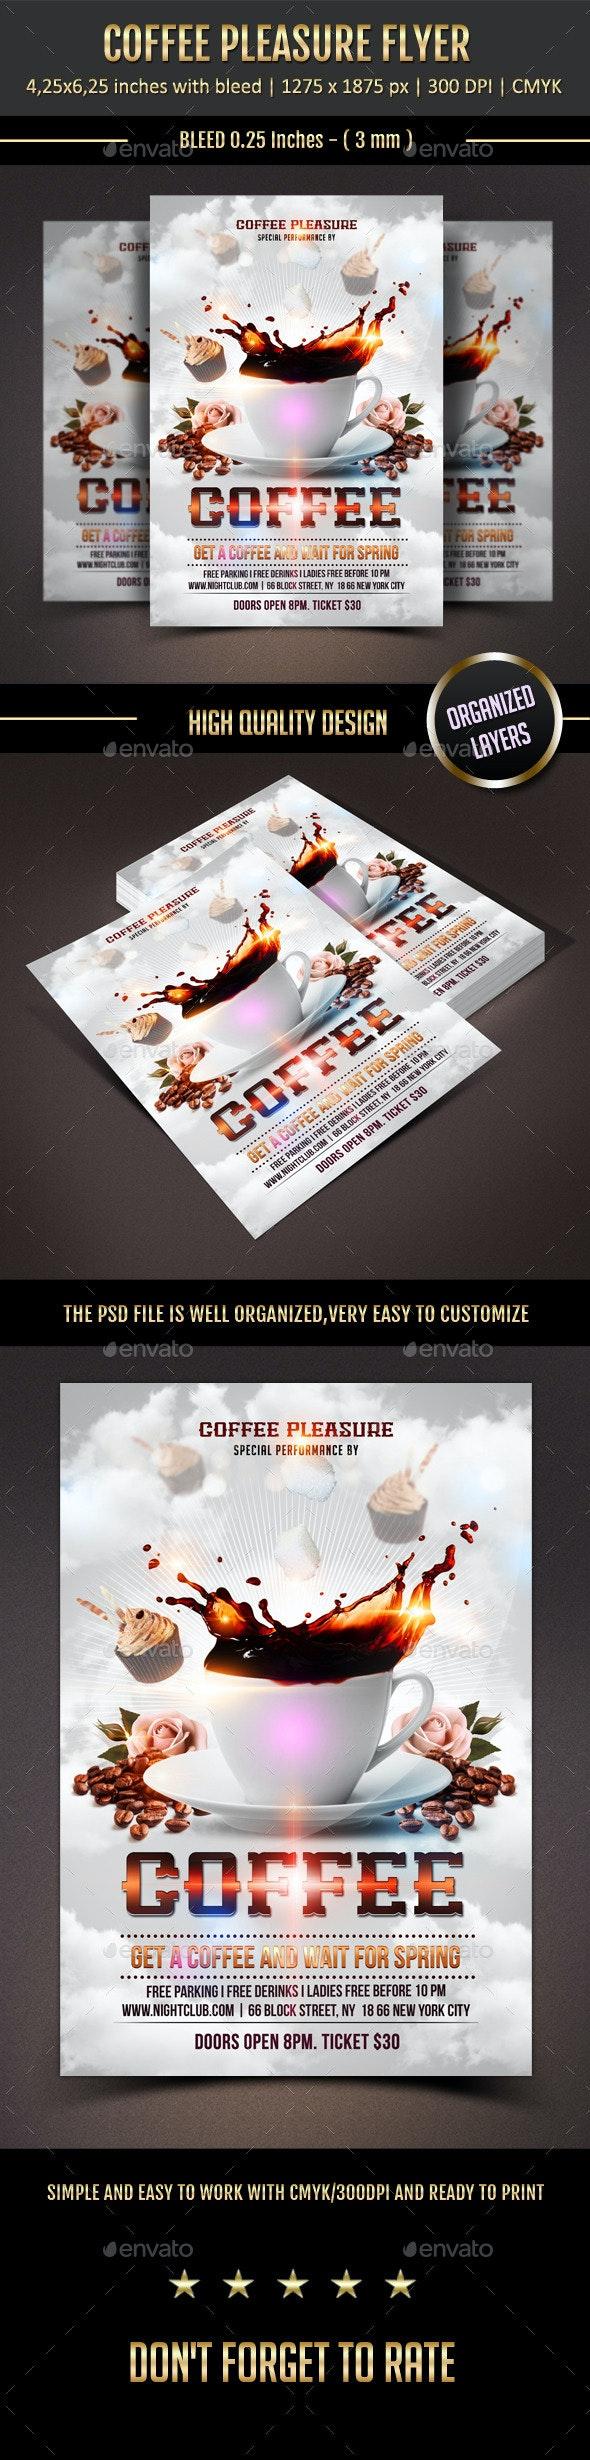 Coffee Pleasure Flyer - Events Flyers